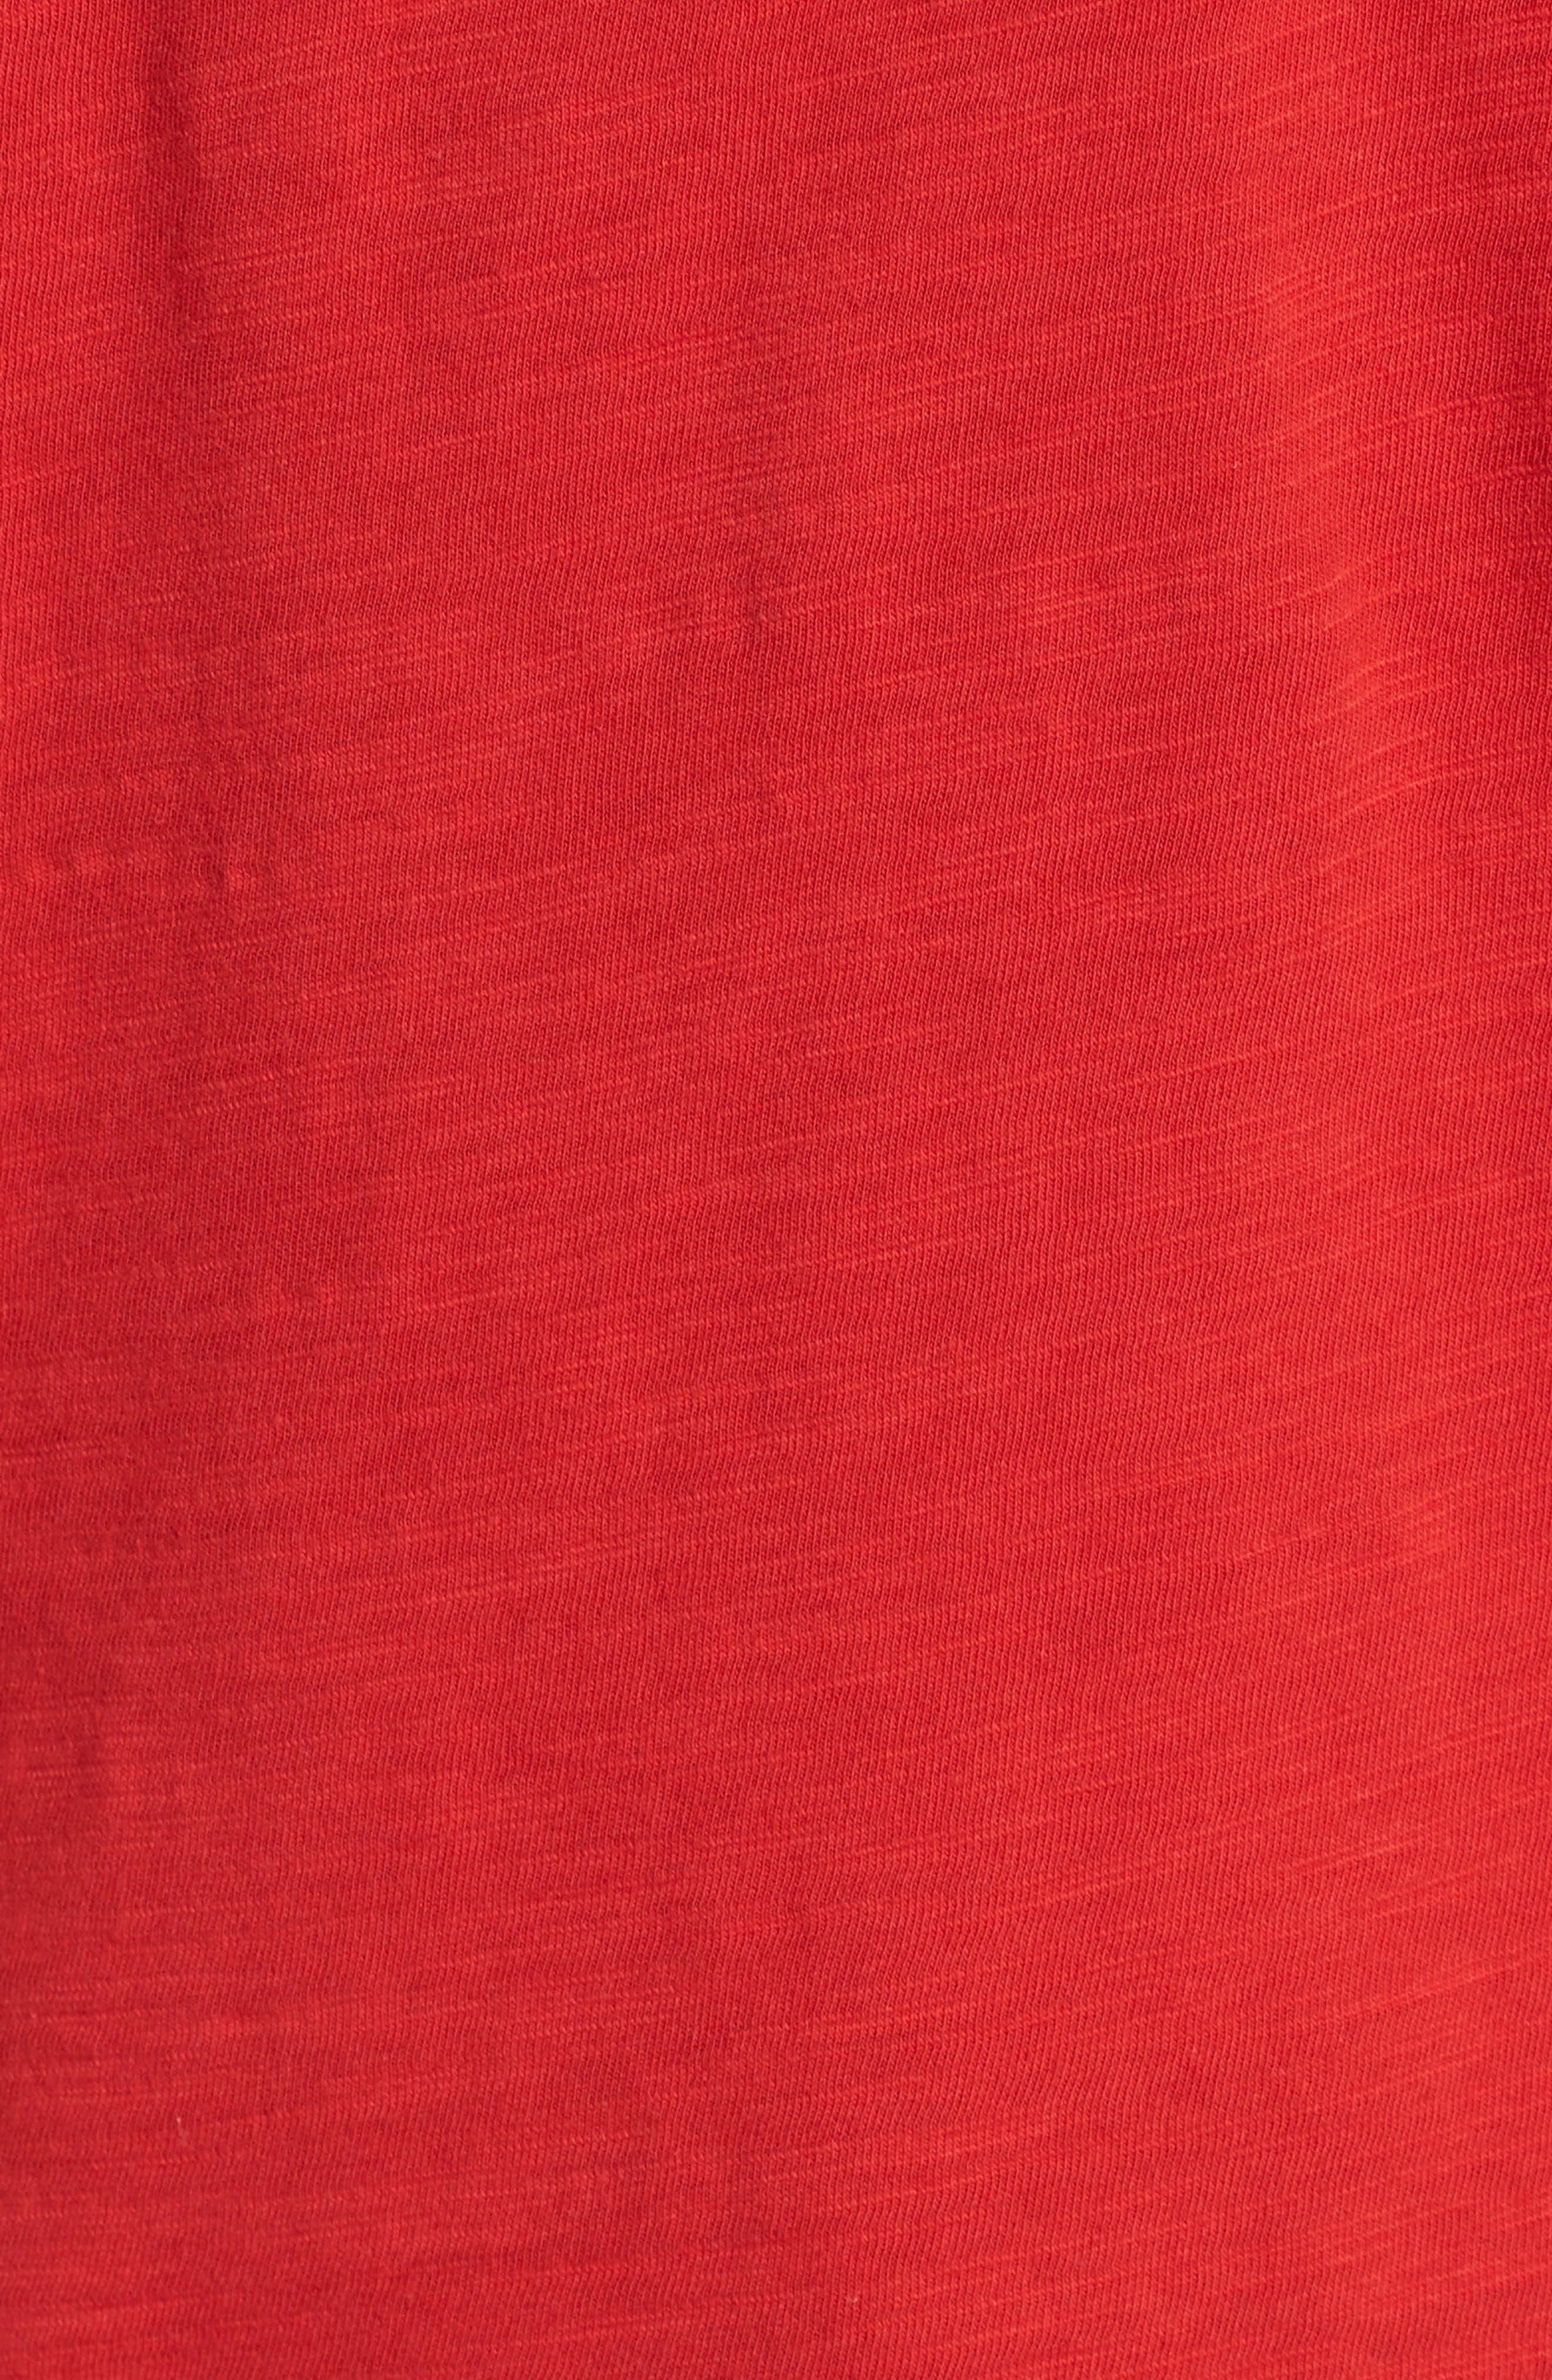 Contrast Pocket Tank,                             Alternate thumbnail 5, color,                             Red Pompeii